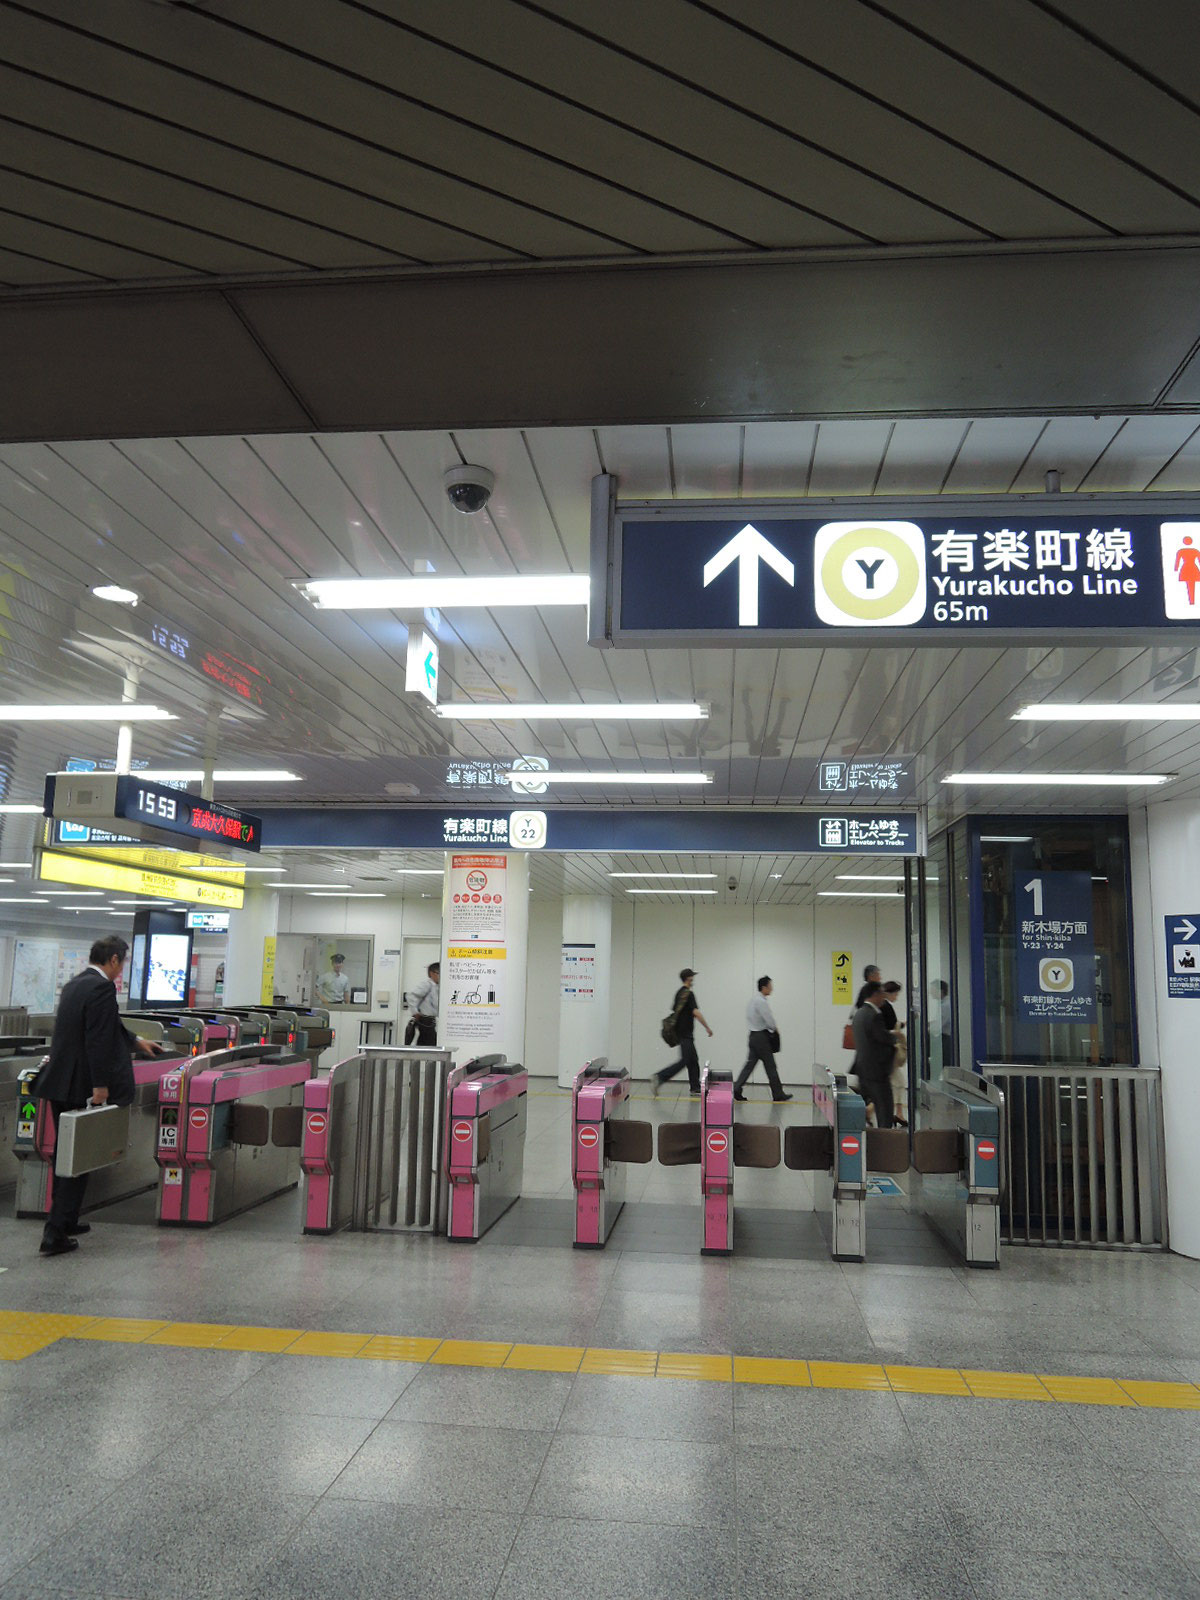 最寄駅は東京メトロ有楽町線「豊洲」駅